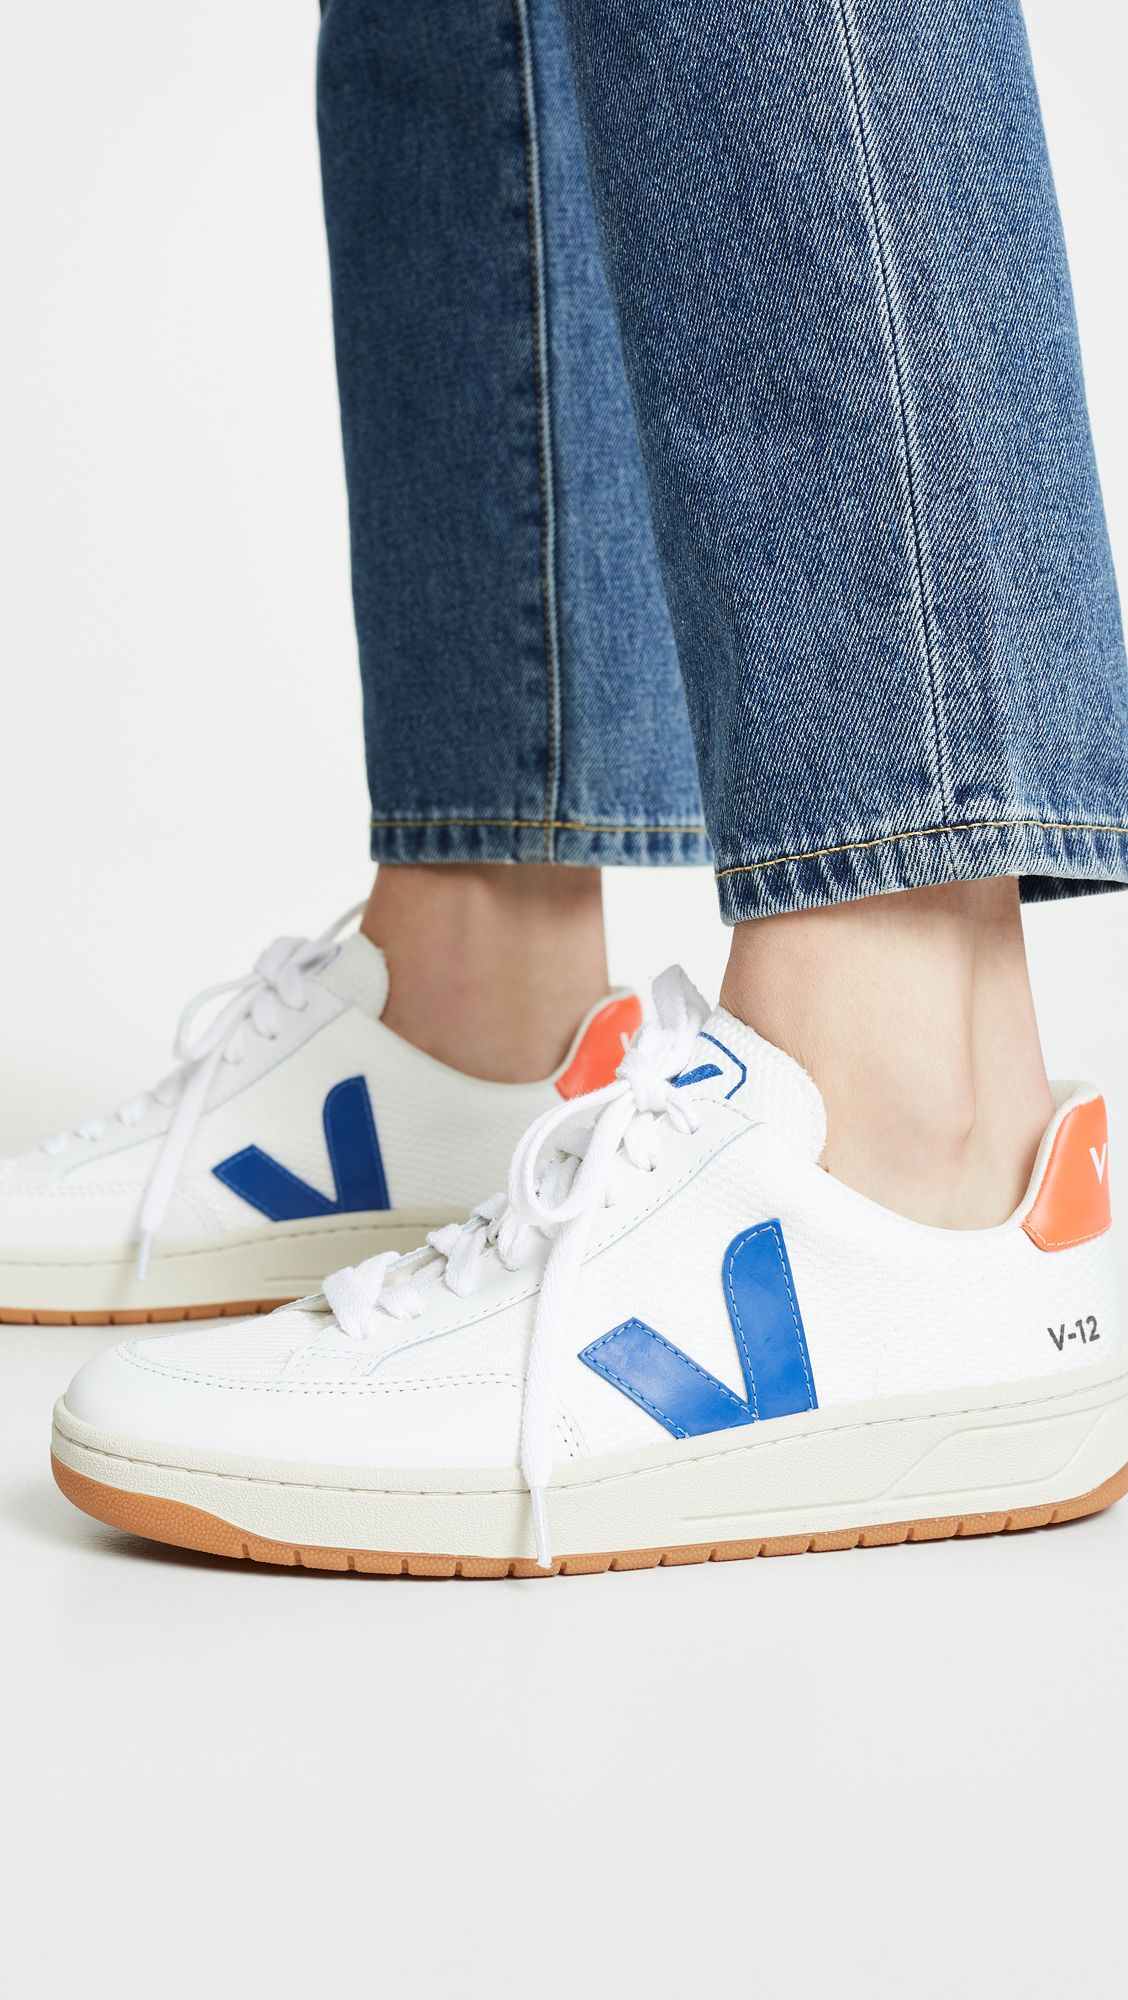 Veja V-12 Lace Up Sneakers in 2020